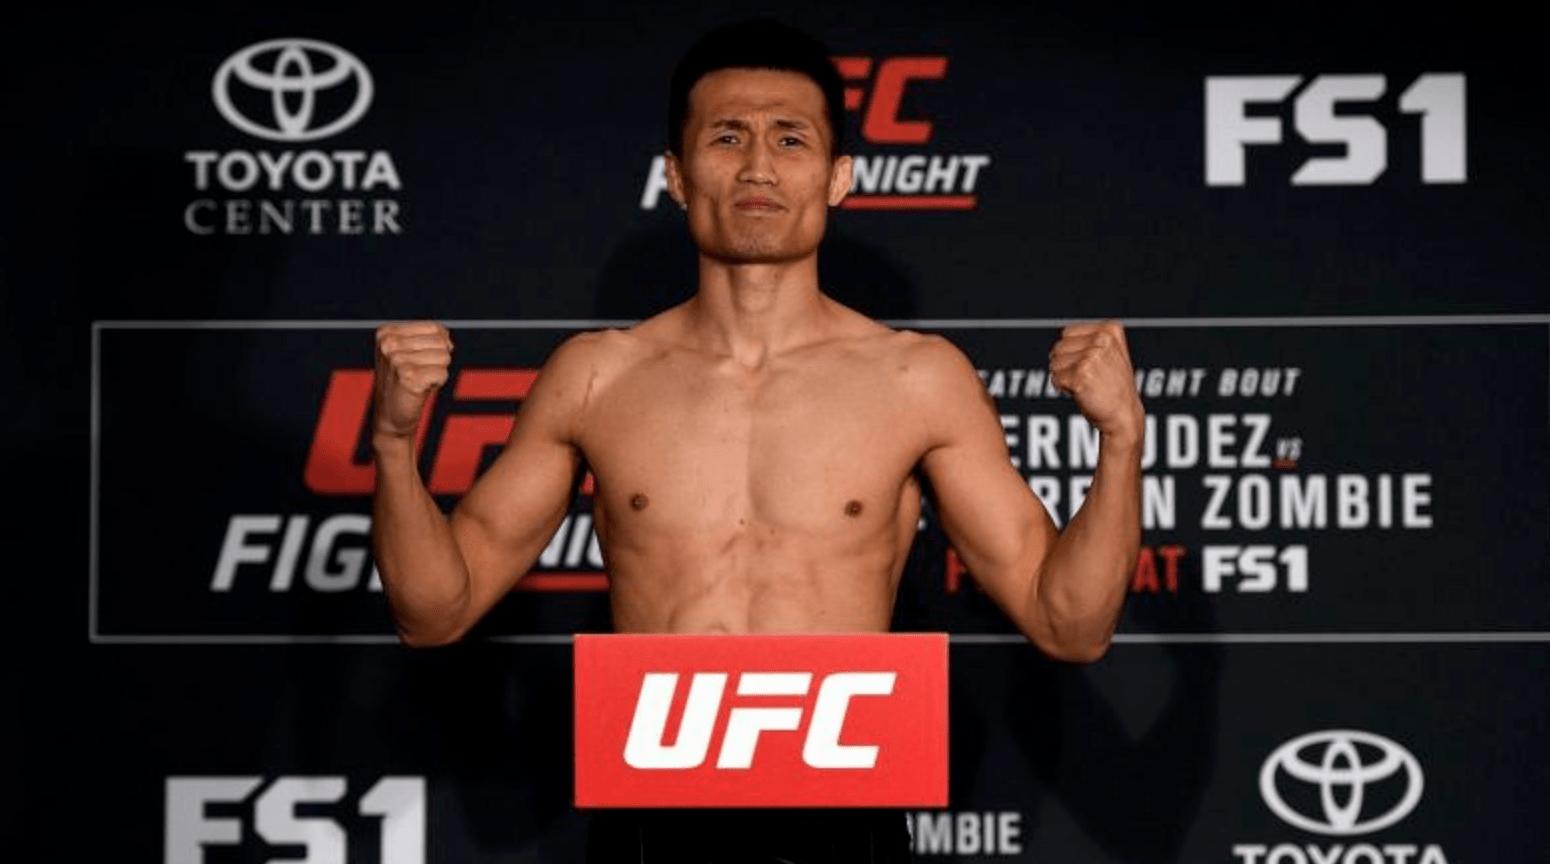 'The Korean Zombie' Isn't Happy With His UFC Ranking